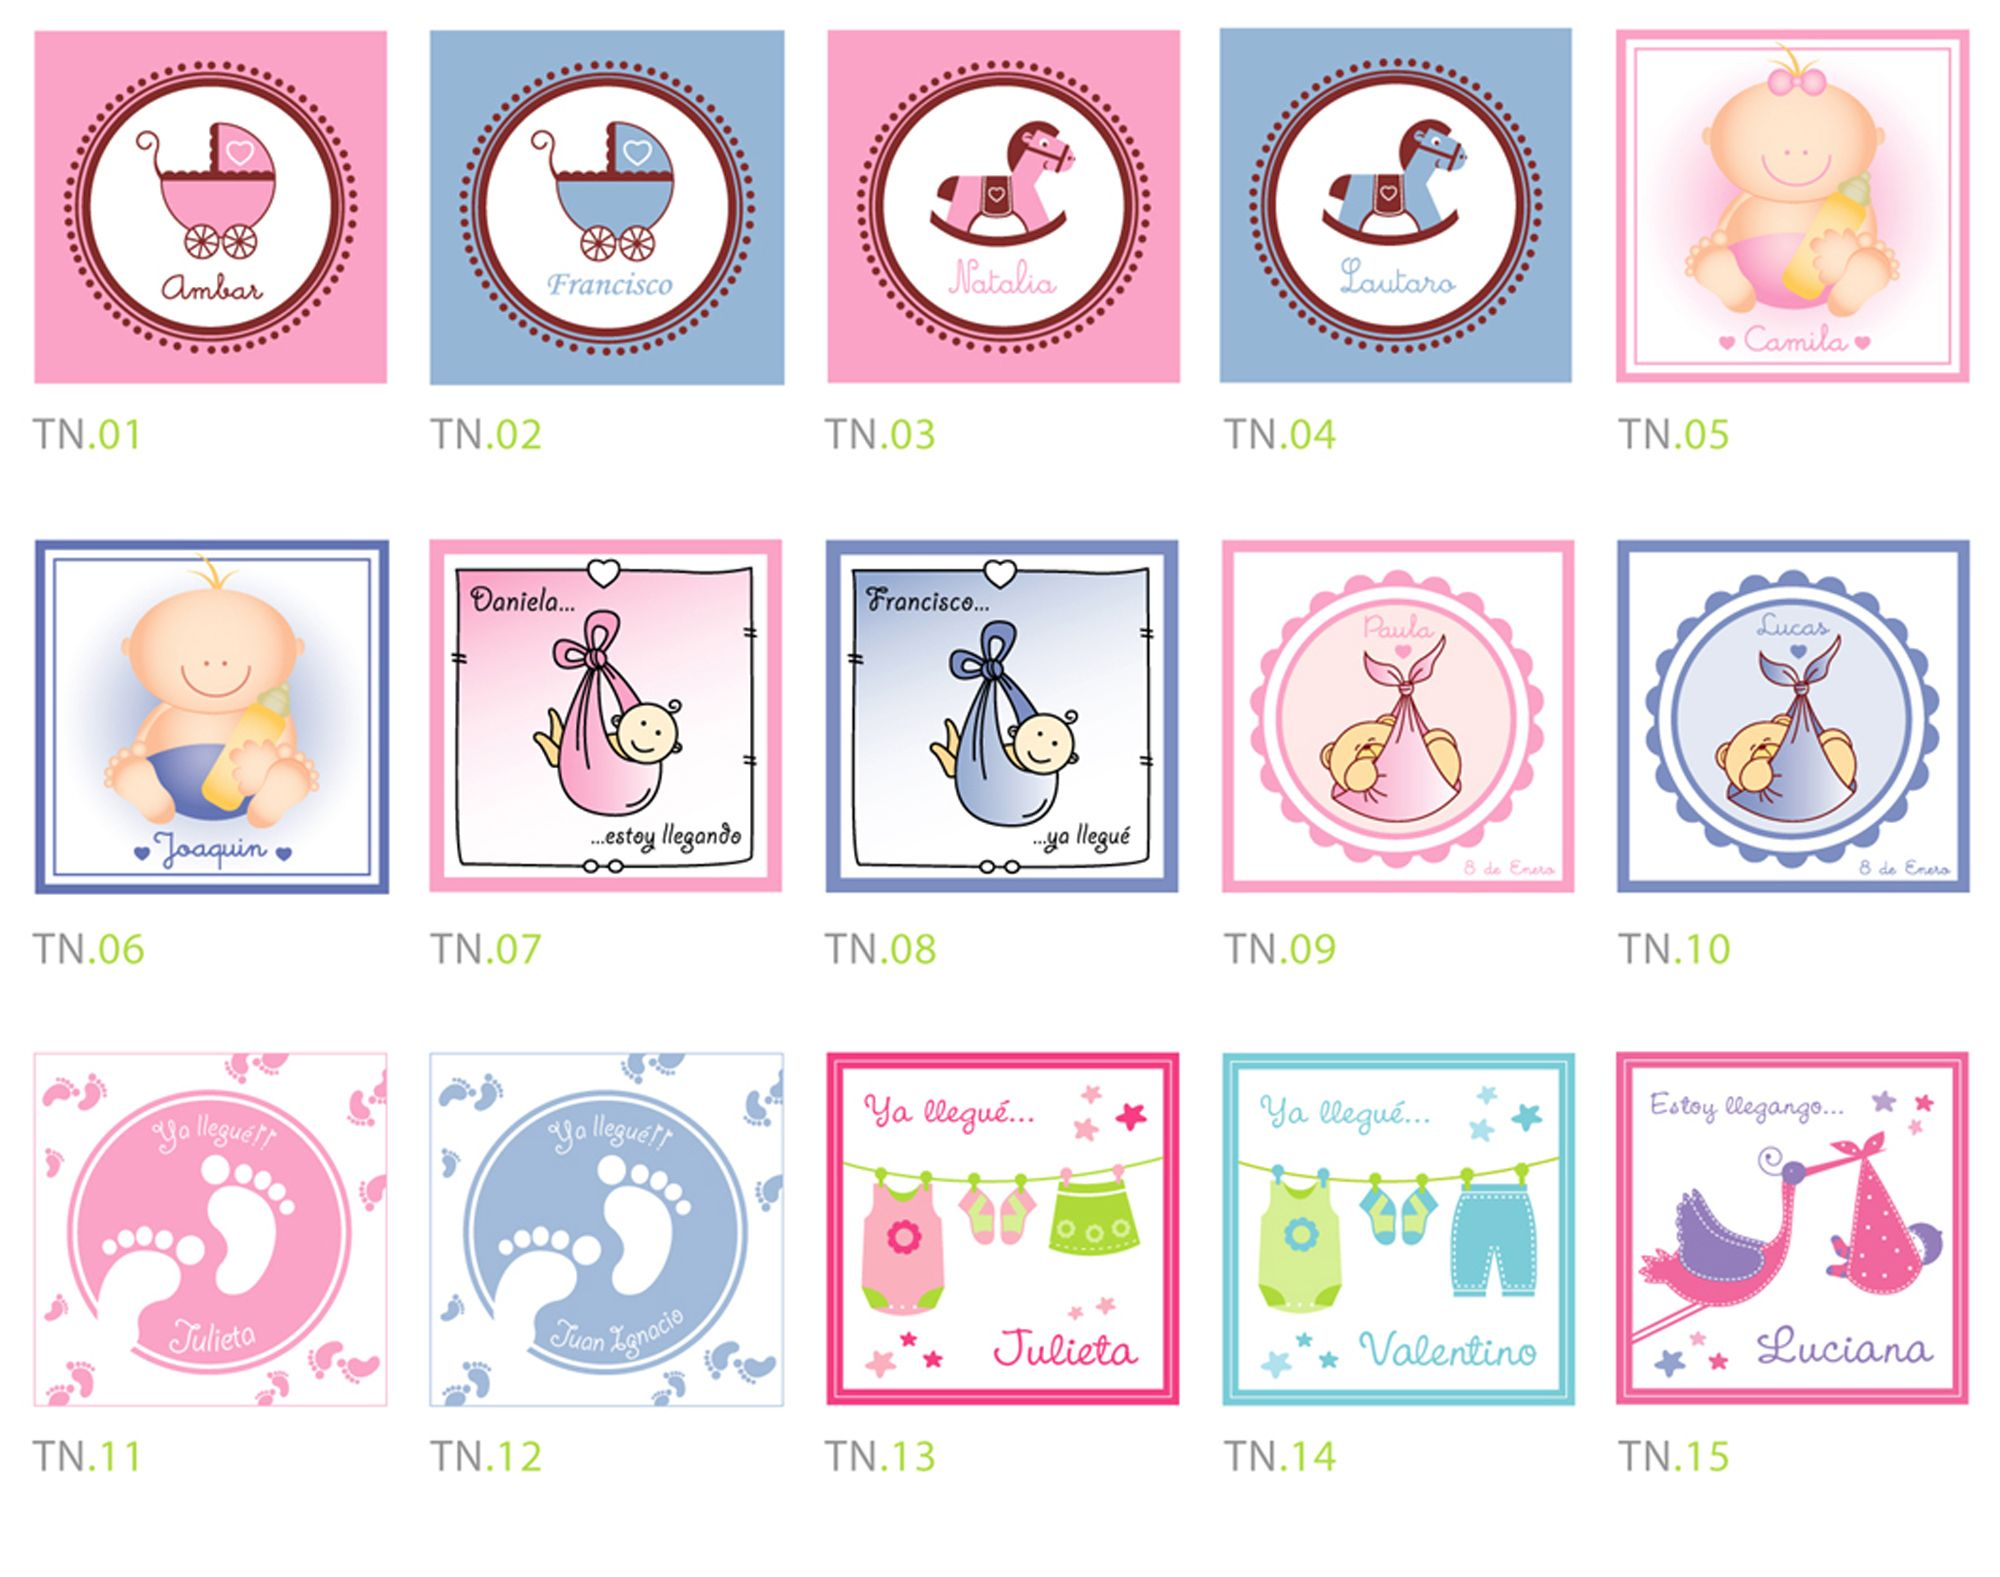 Tarjetas de souvenir de nacimiento para imprimir gratis - Imagui ...